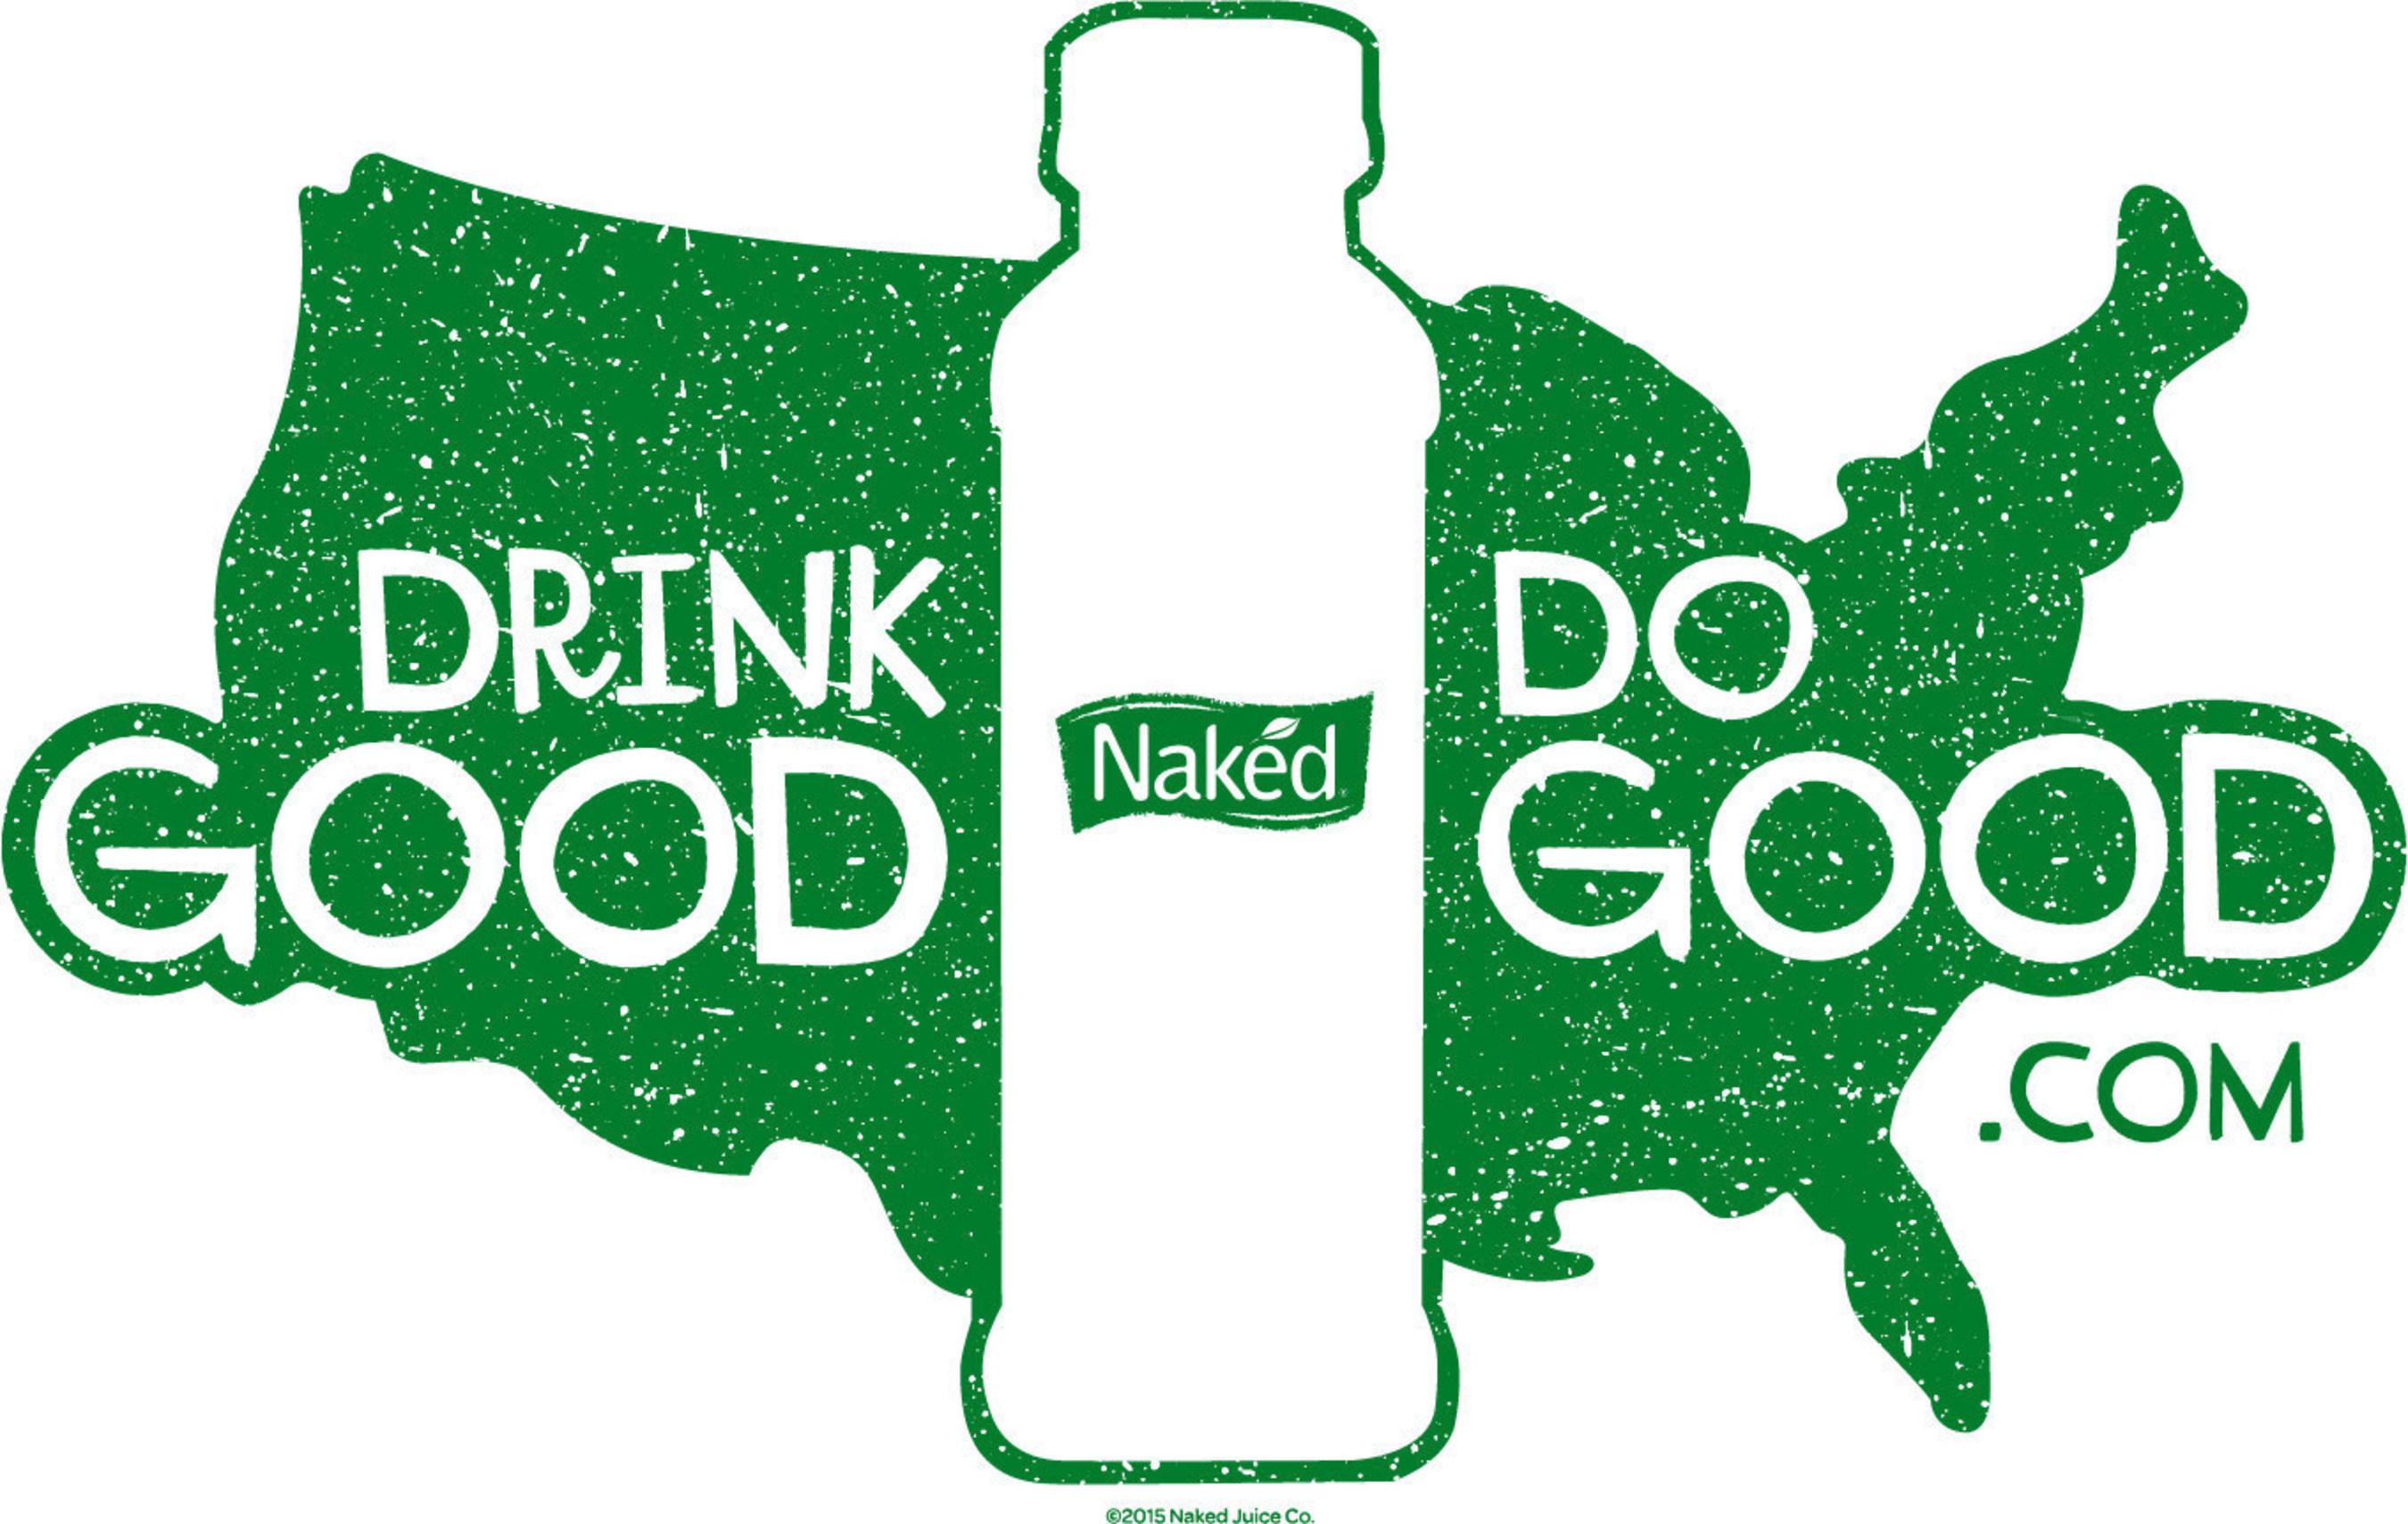 Drink Good. Do Good. logo.